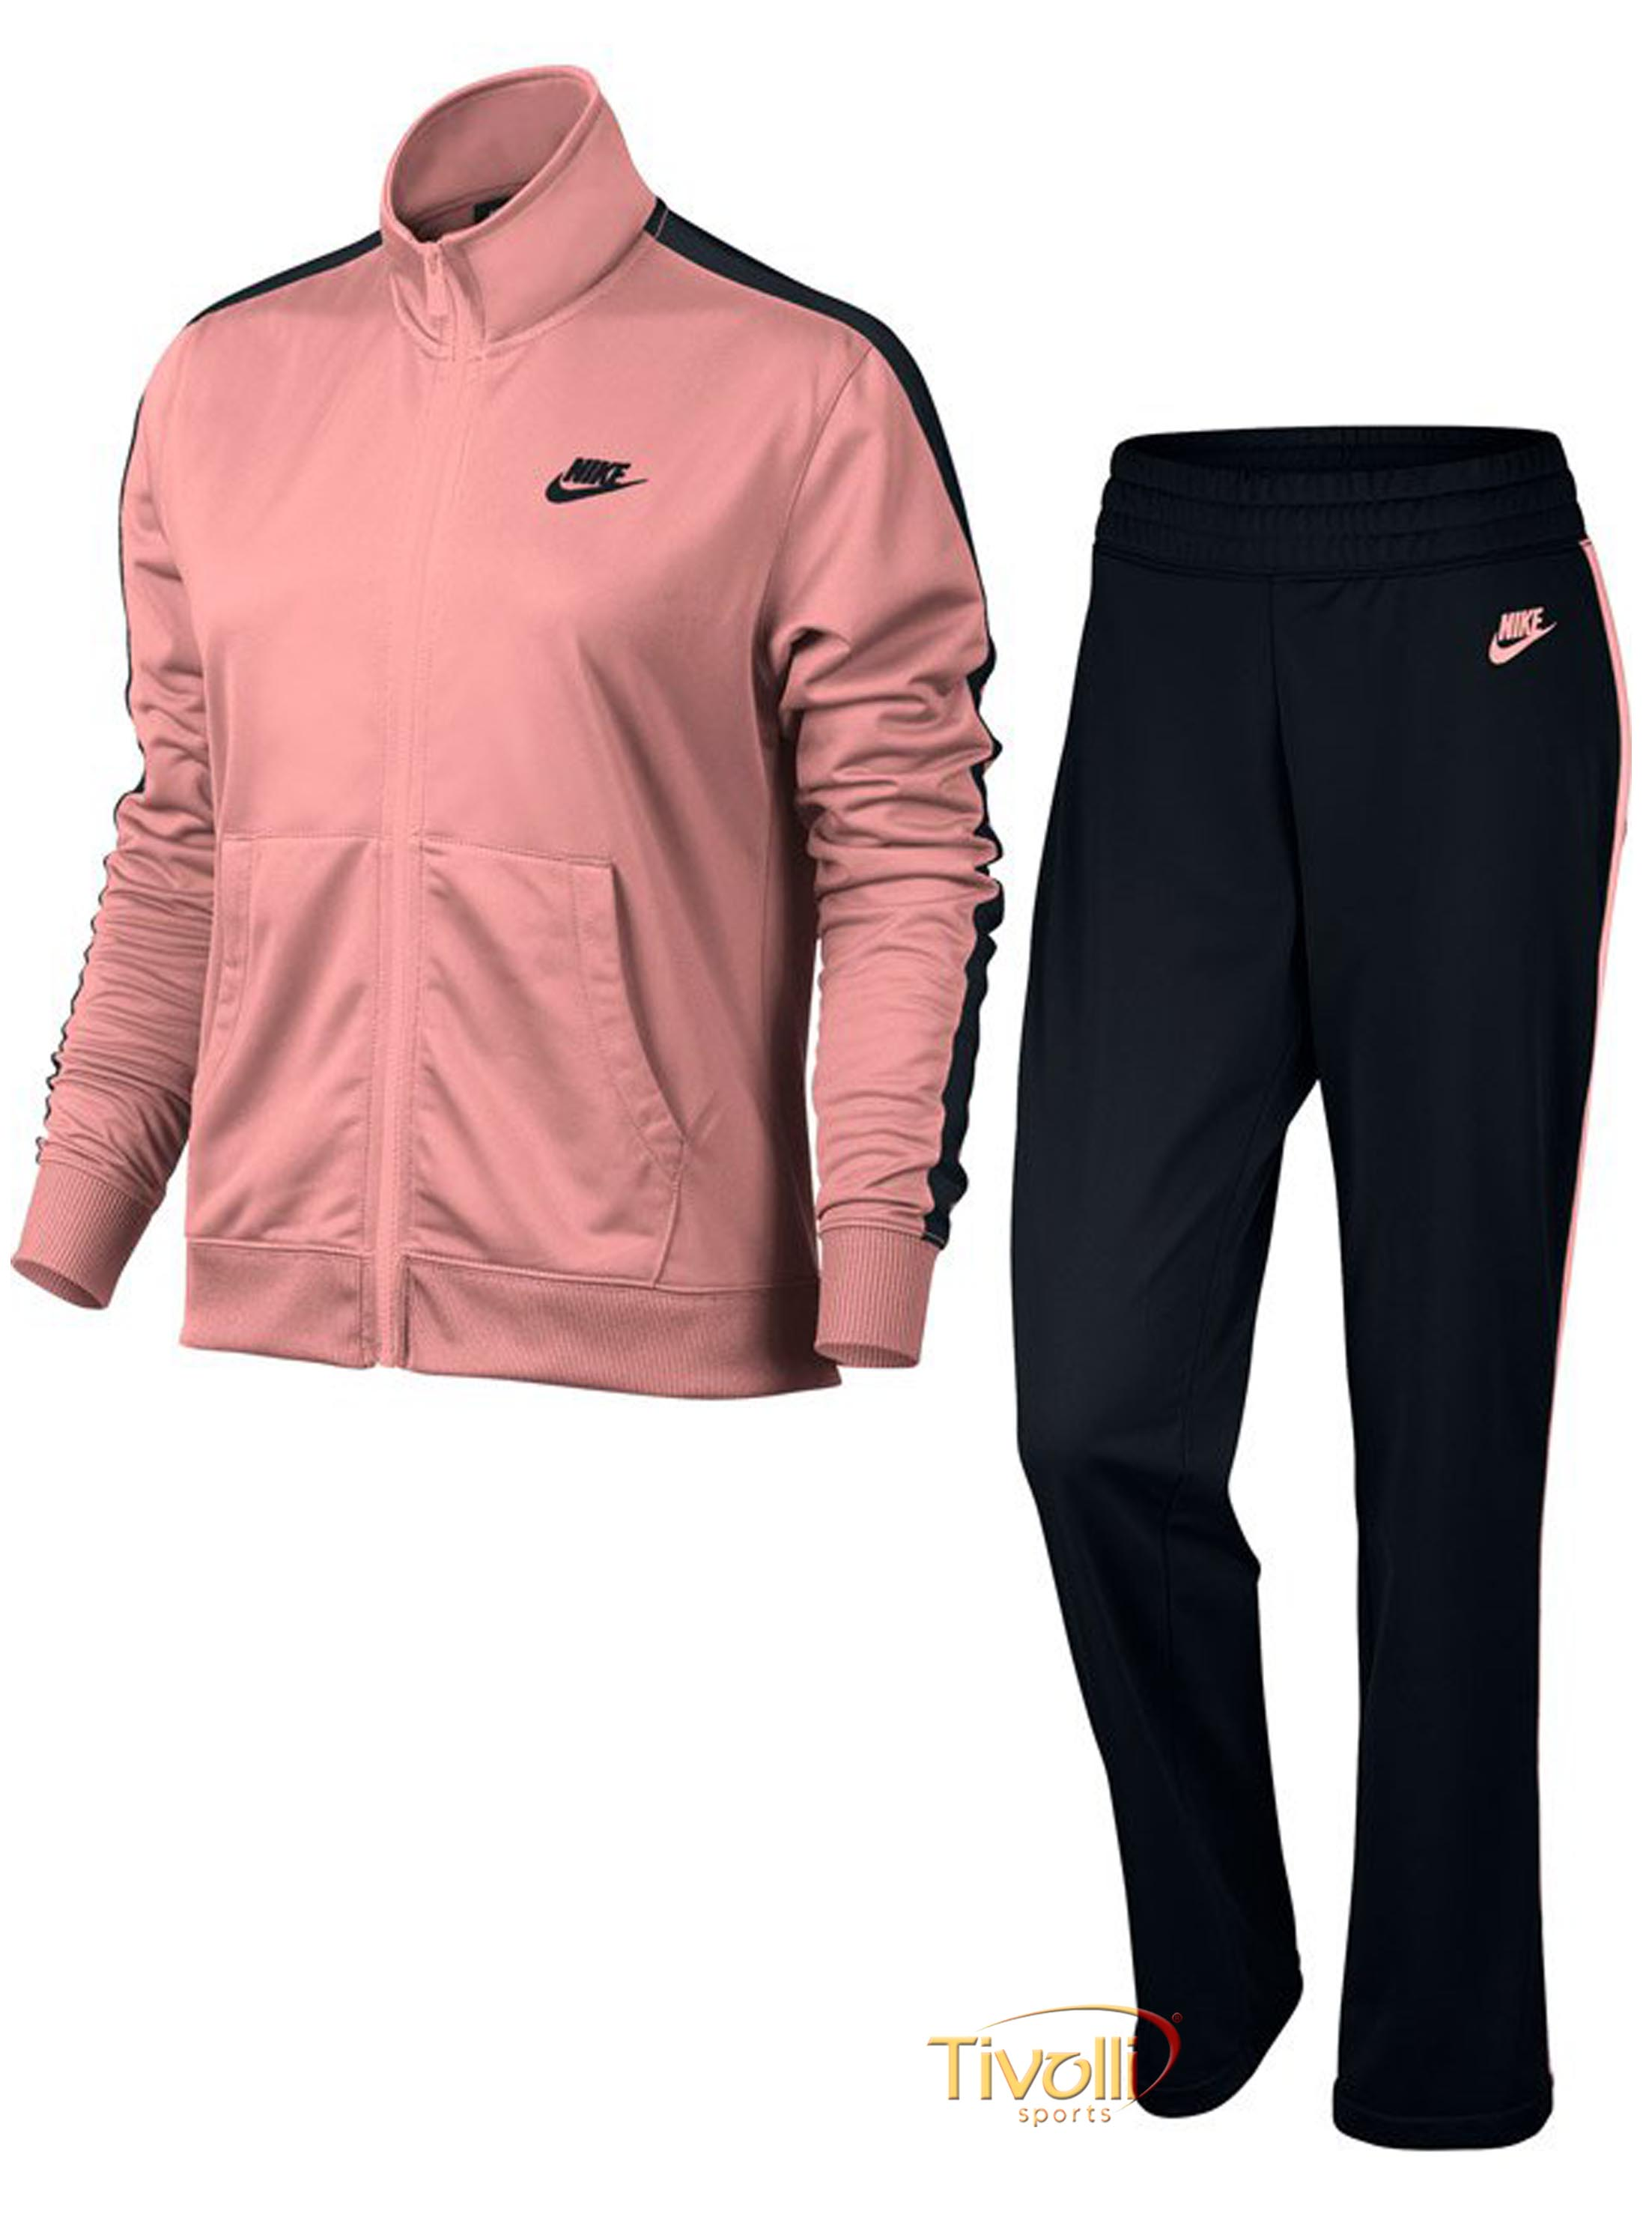 70a18fd25c ... c701022c1f1 Agasalho Nike Sportswear Track Suit Feminino Rosa e Preto  ...